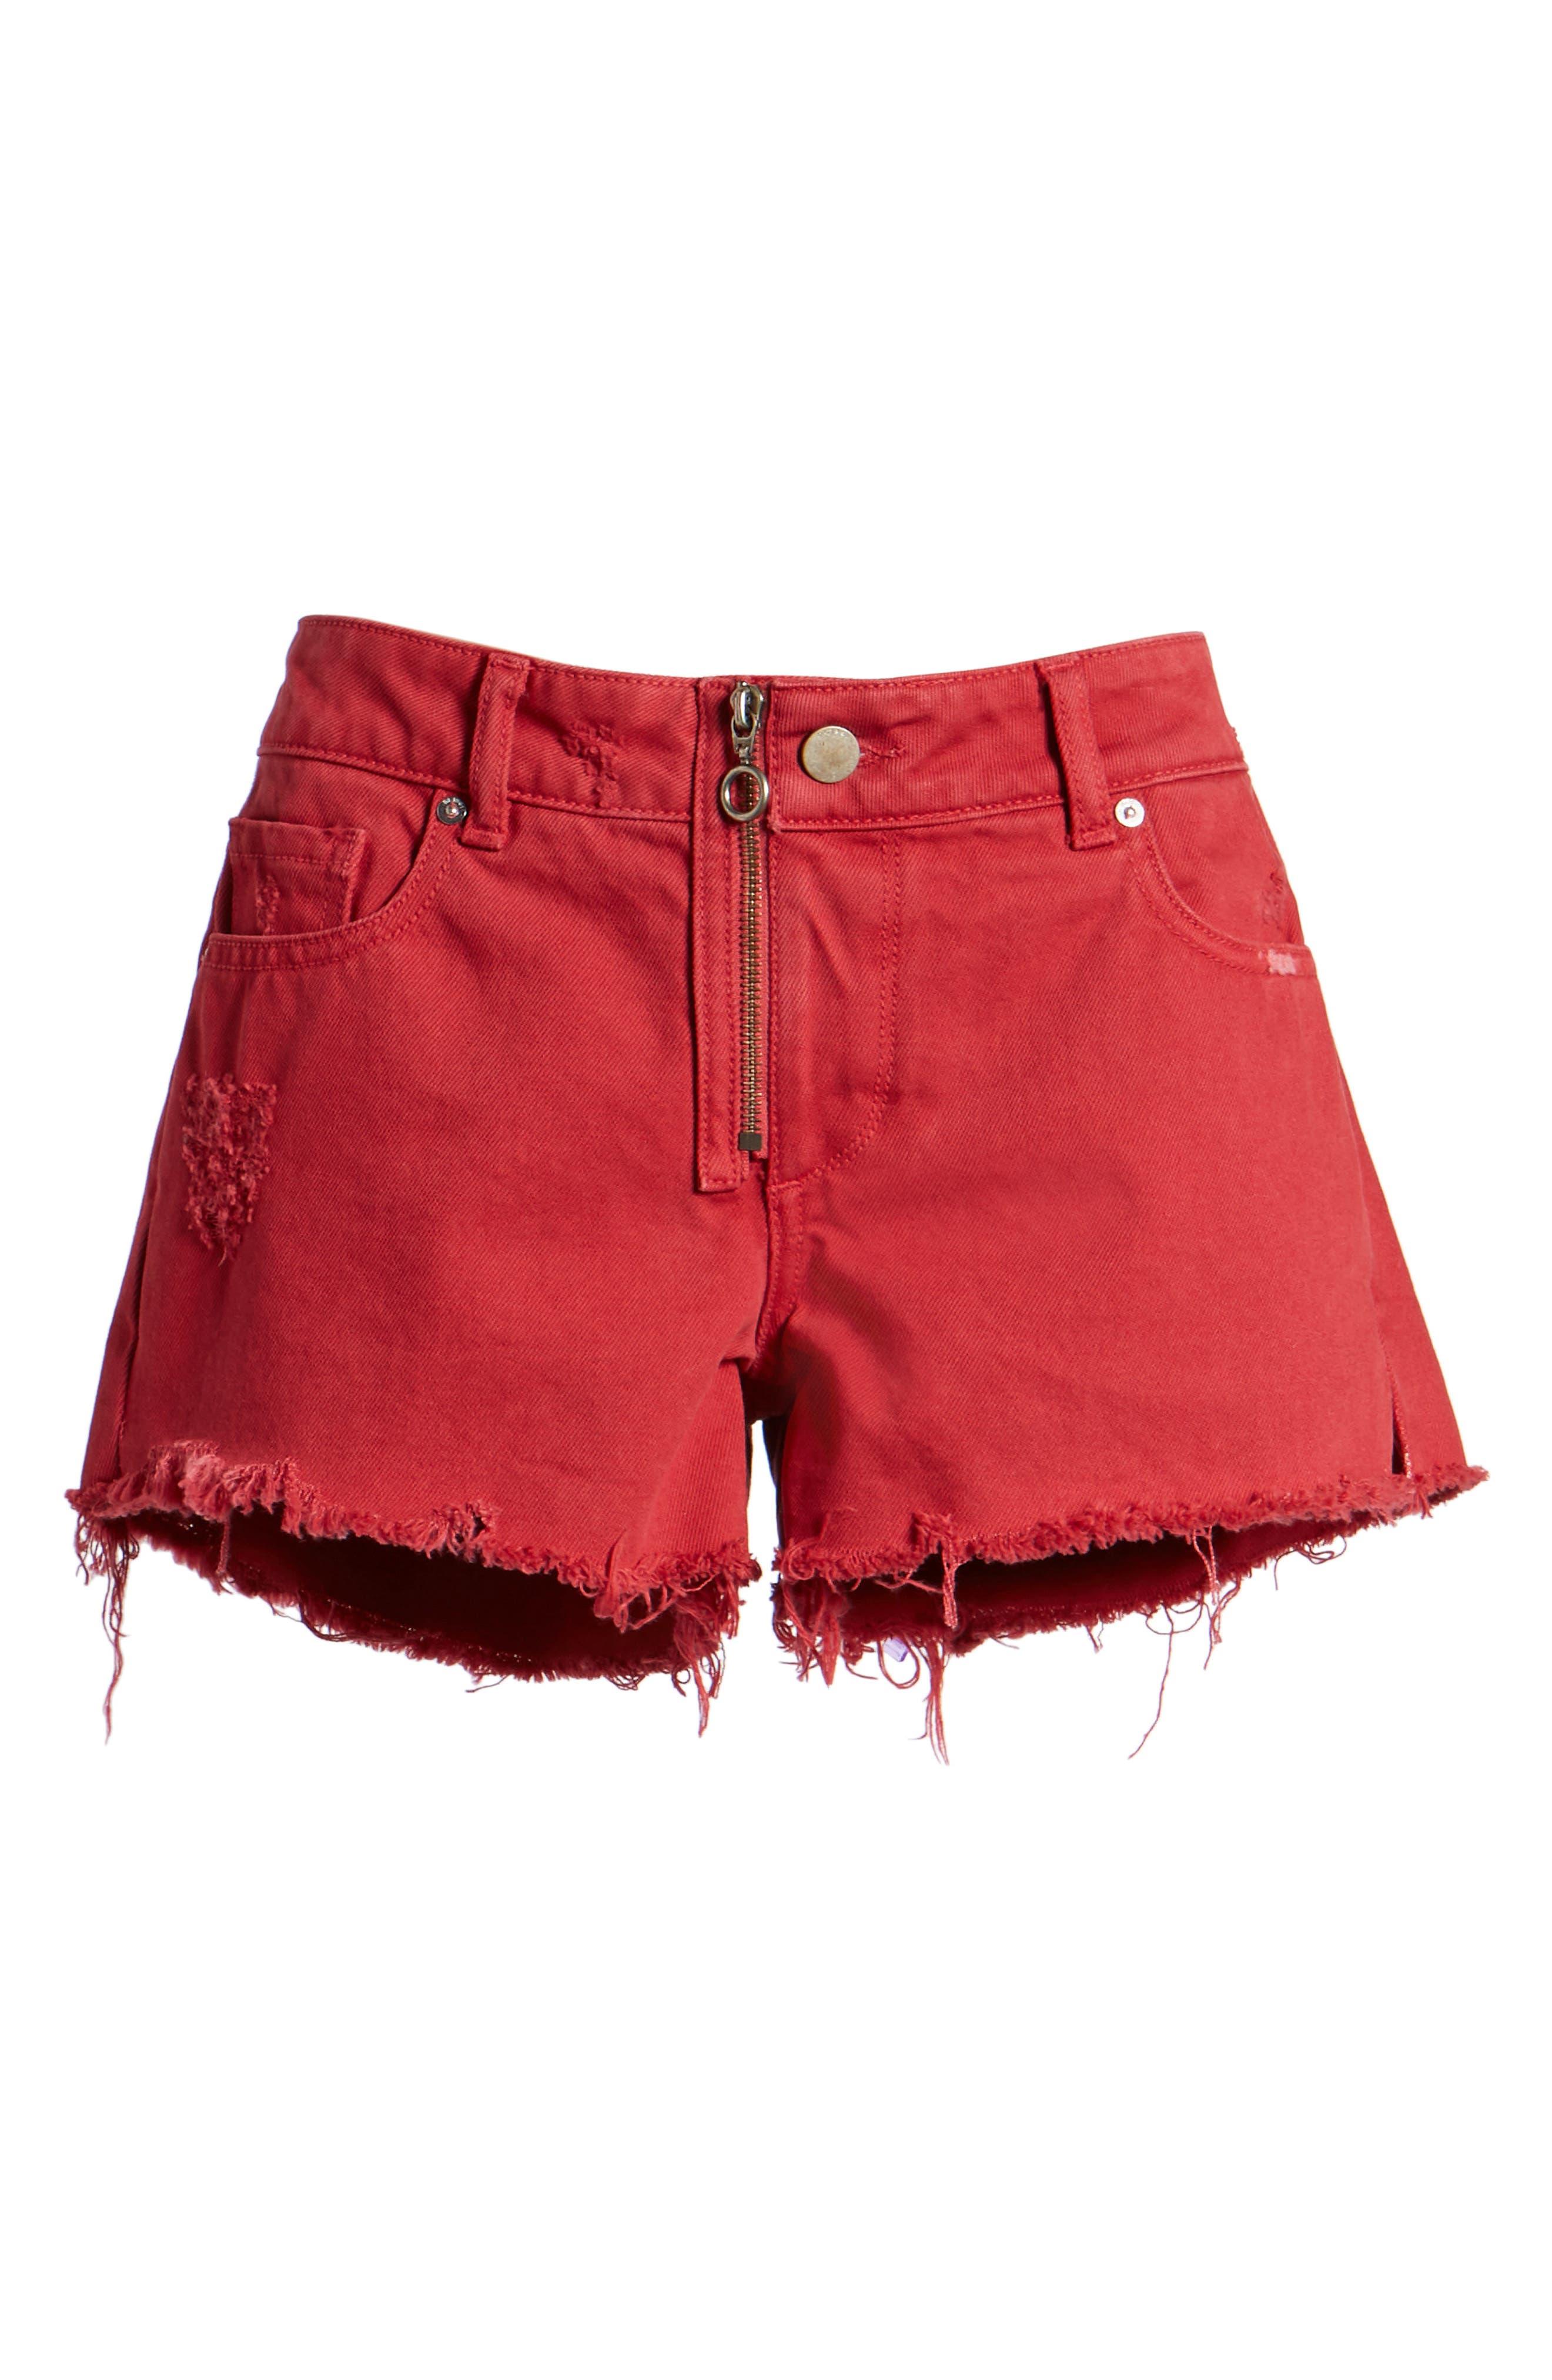 Renee Cutoff Denim Shorts,                             Alternate thumbnail 7, color,                             600